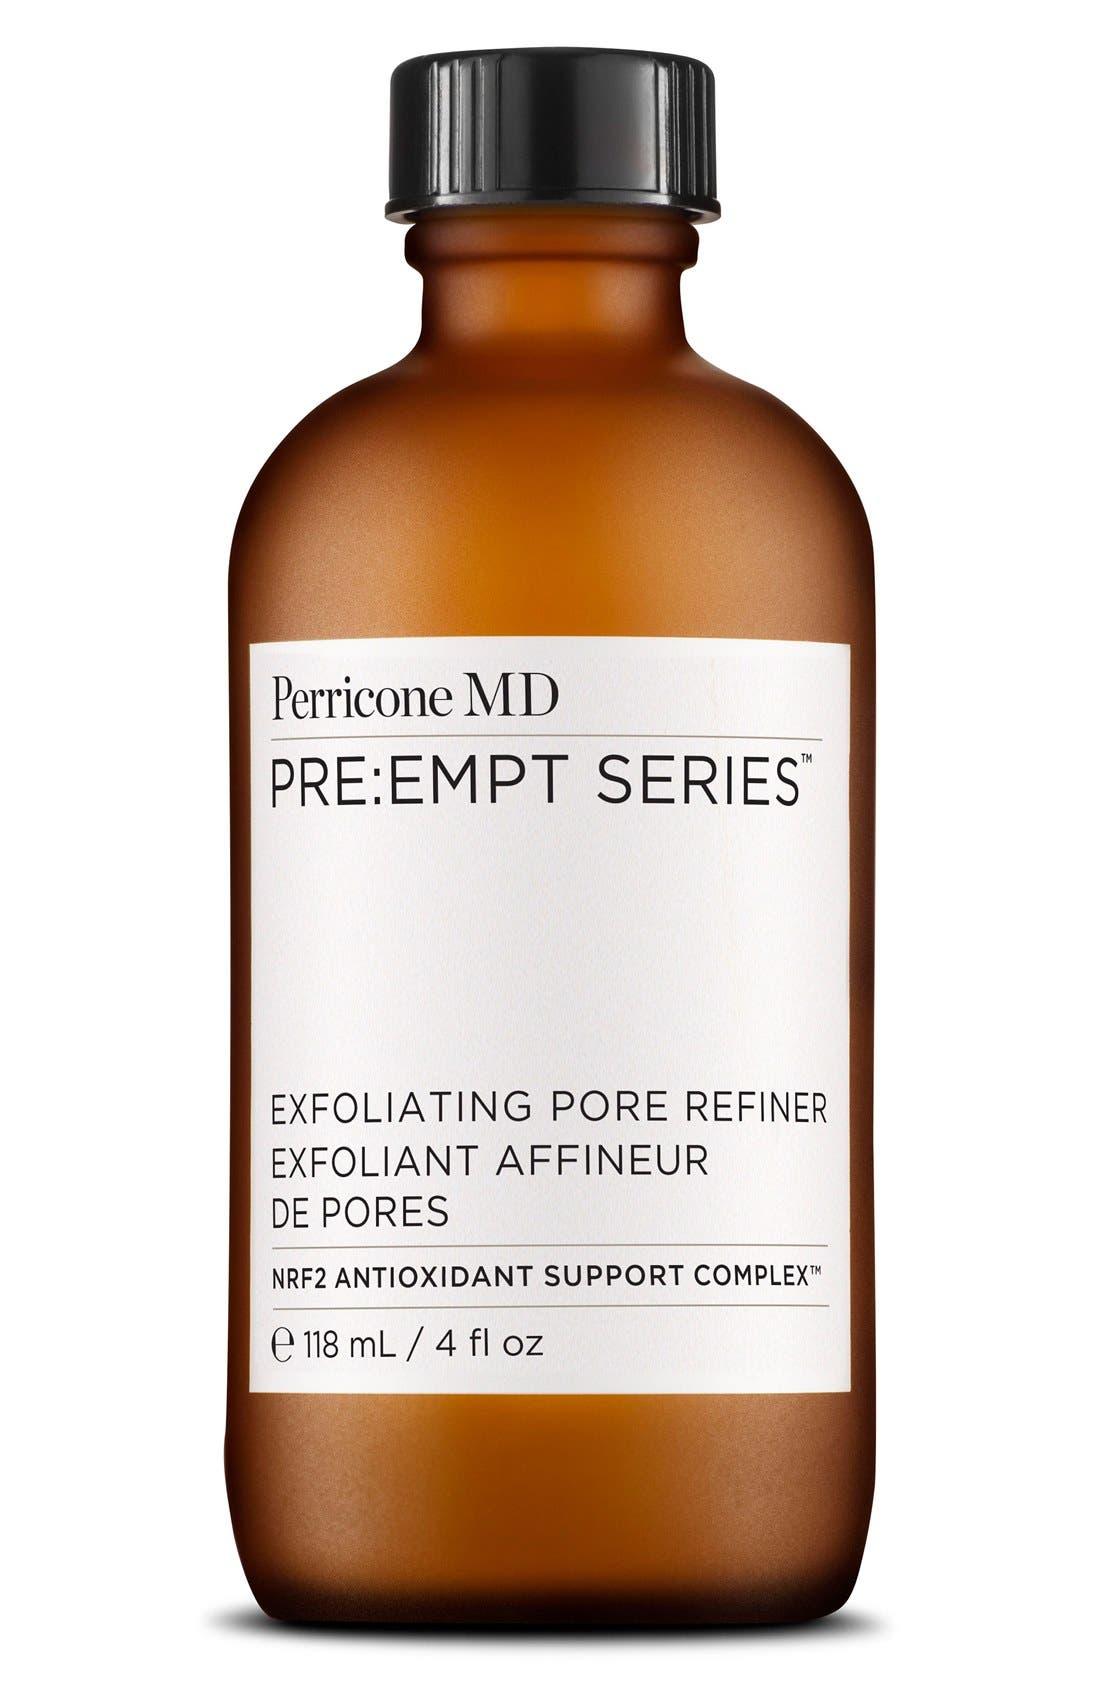 Perricone MD PRE EMPT SERIES™ Exfoliating Pore Refiner